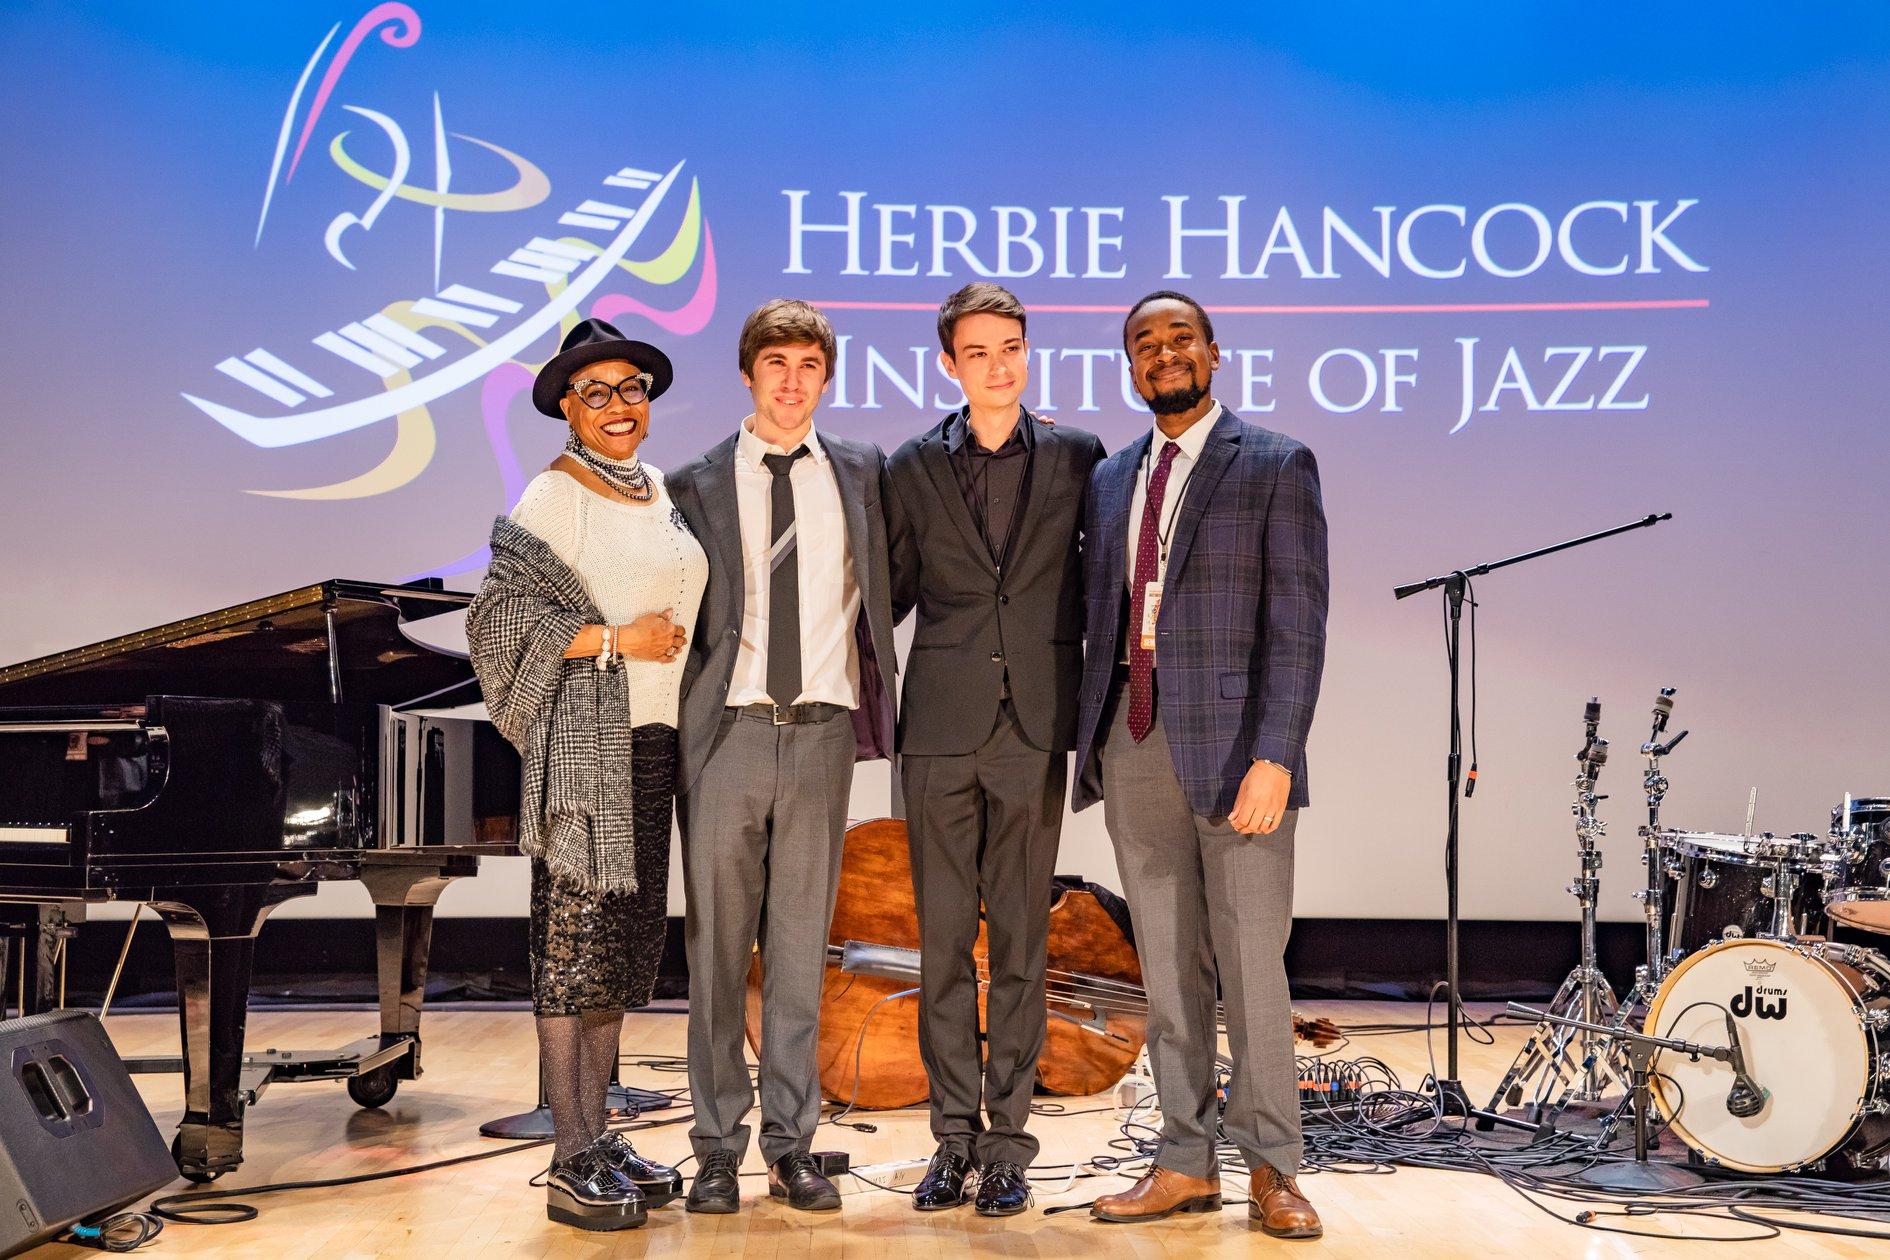 Ведущая конкурса, певица Ди Ди Бриджуотер, и три финалиста: Макс Лайт, Евгений Побожий и Сесил Александер (photo © Herbie Hancock Institute of Jazz)